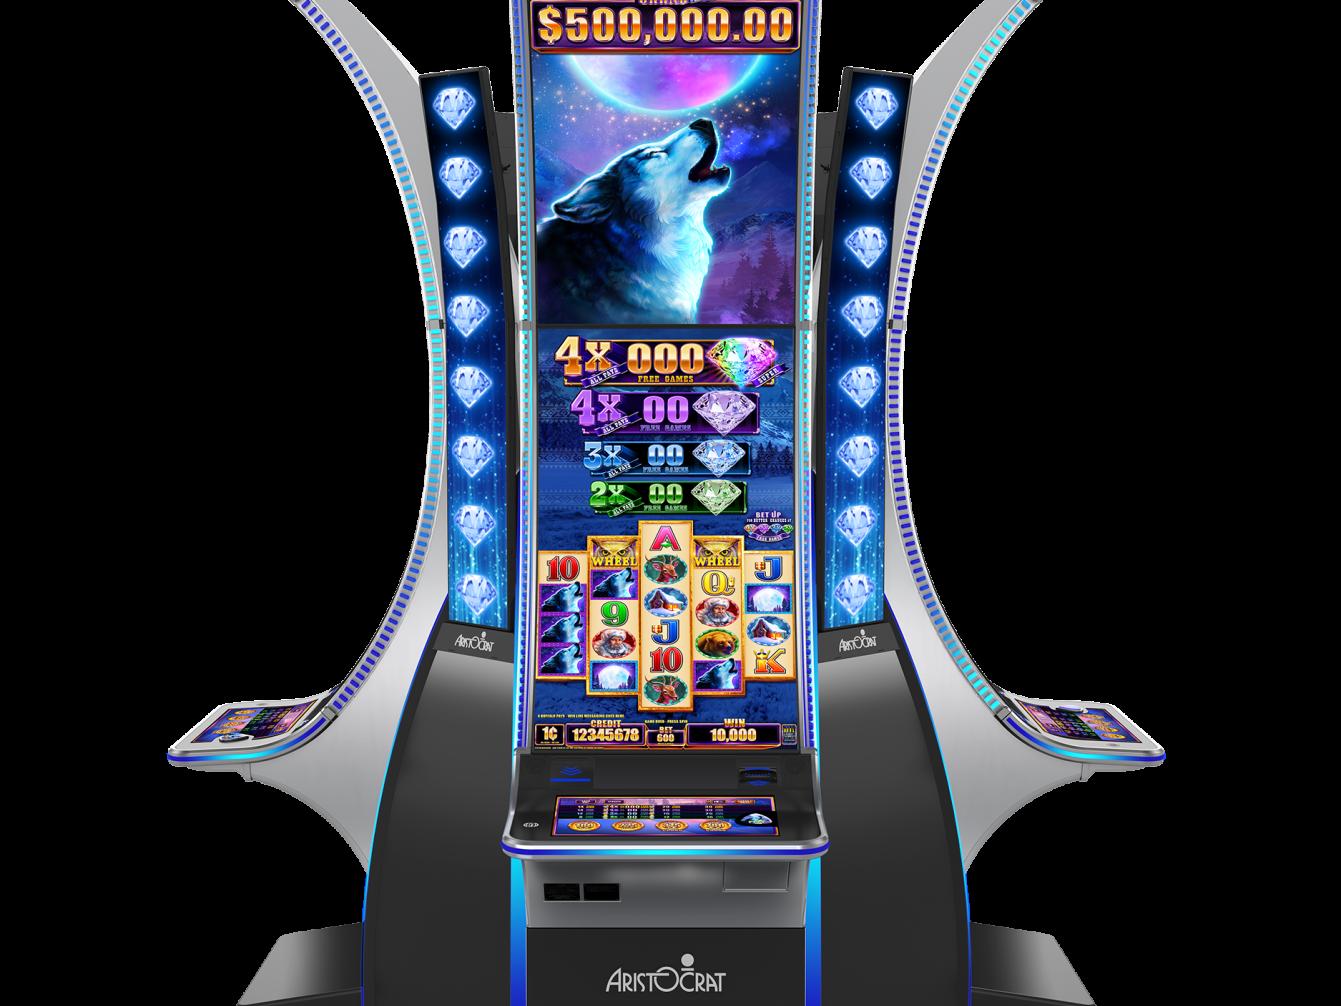 Timber wolf slot machine rules